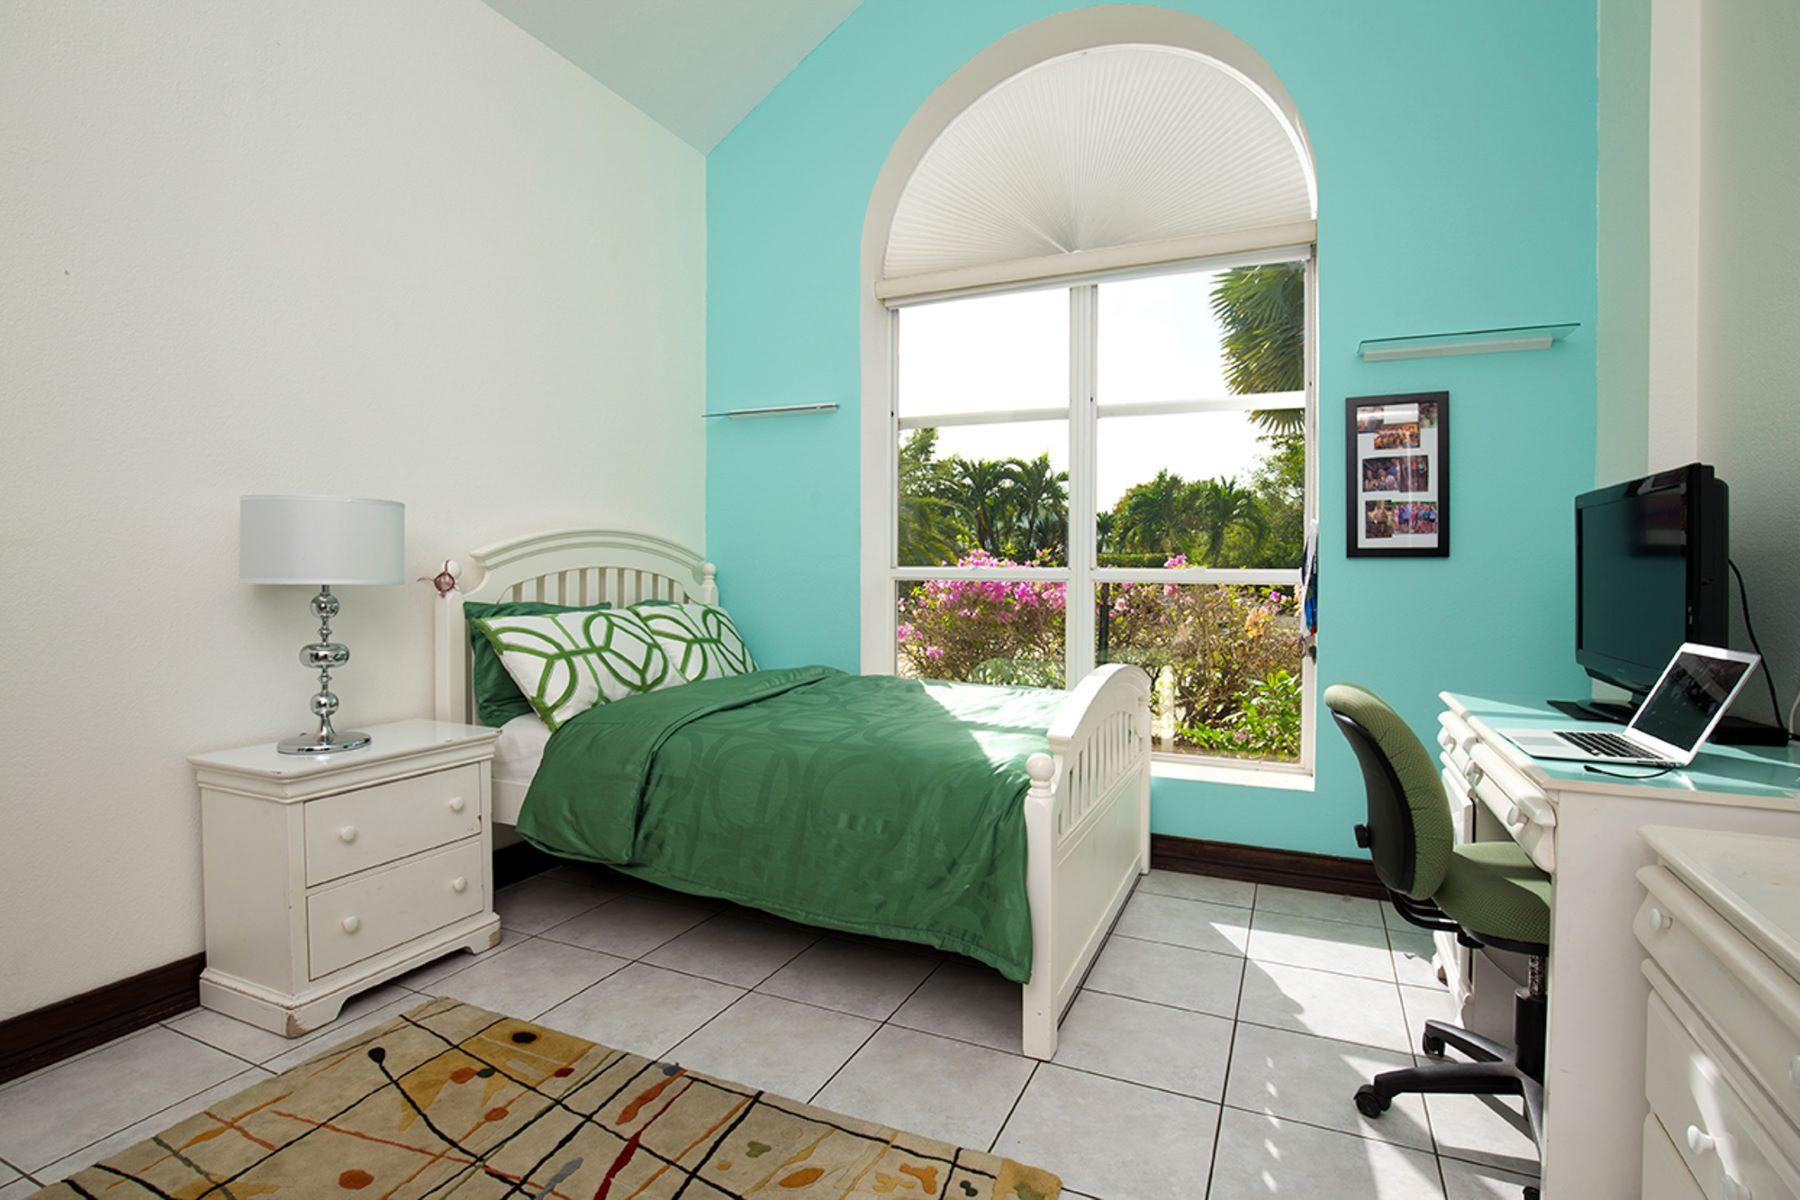 Additional photo for property listing at Patrick's Island Executive Villa Other Cayman Islands, Otras Áreas En Las Islas Caimán Islas Caimán